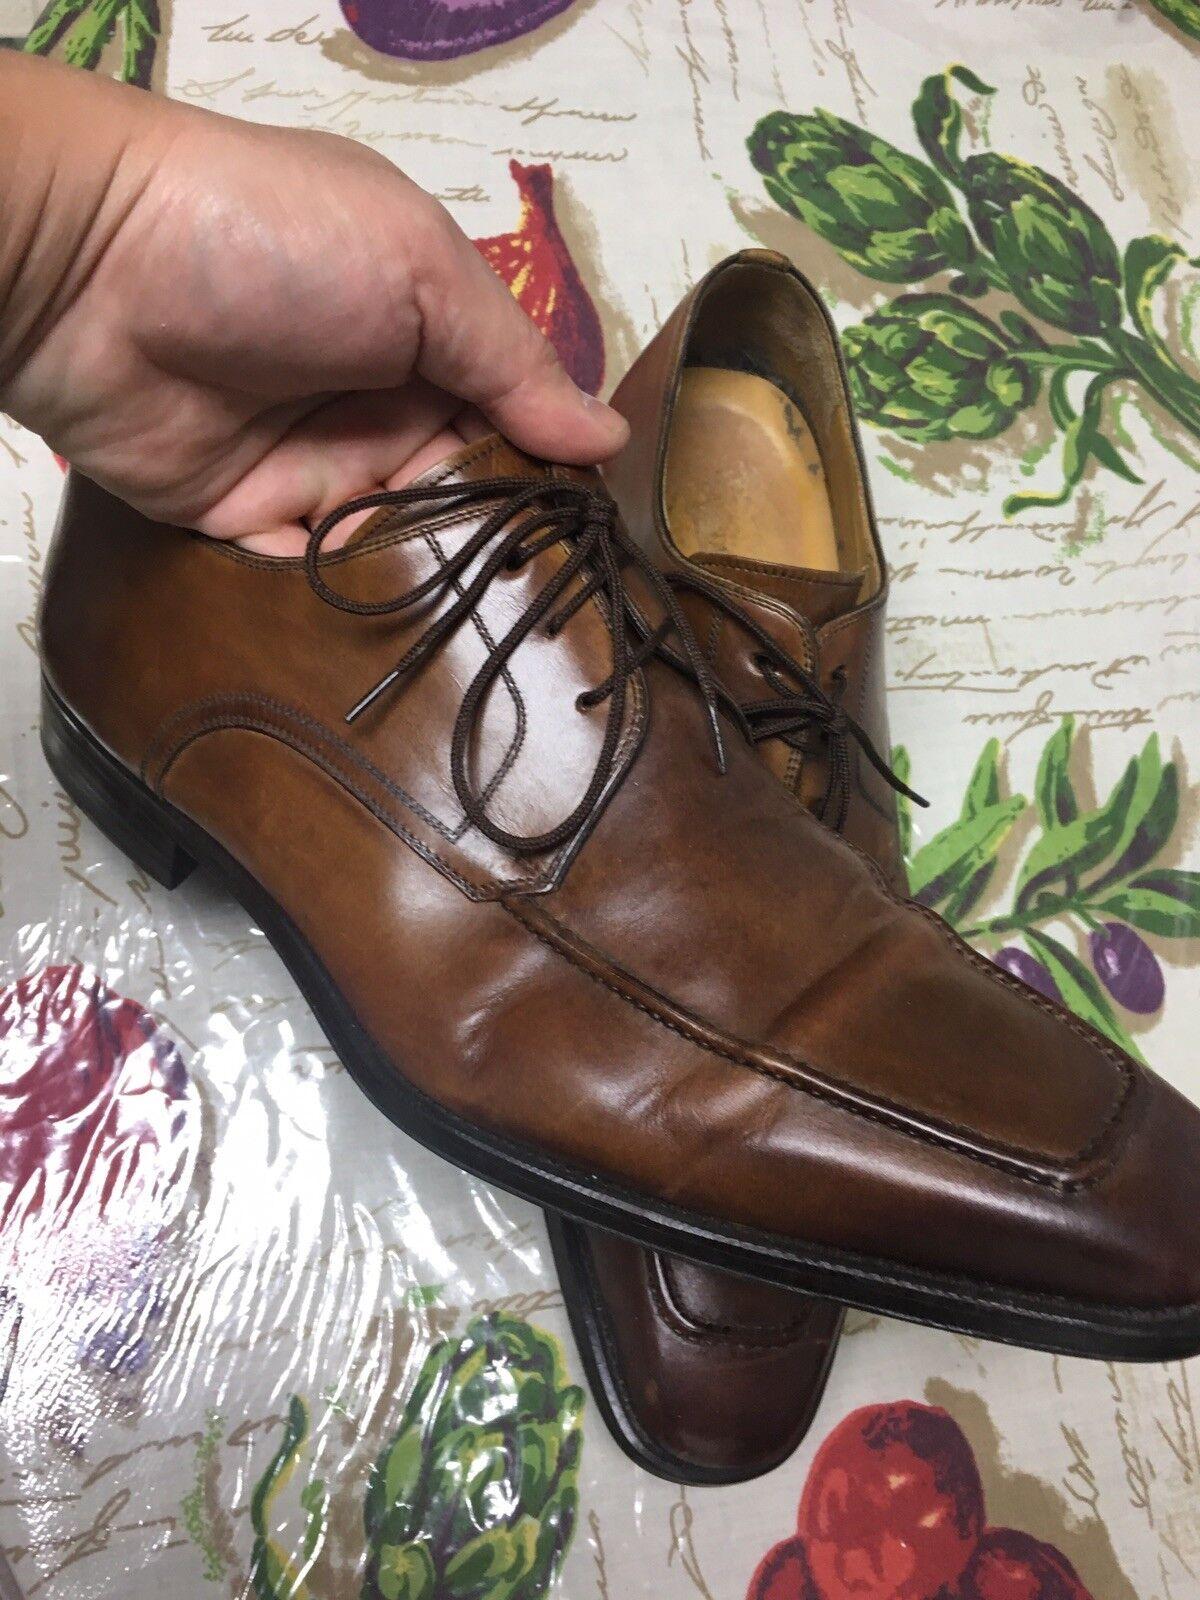 Magnanni 13723 Men's Oxford schuhe 9.5 M Light braun Leather EUC